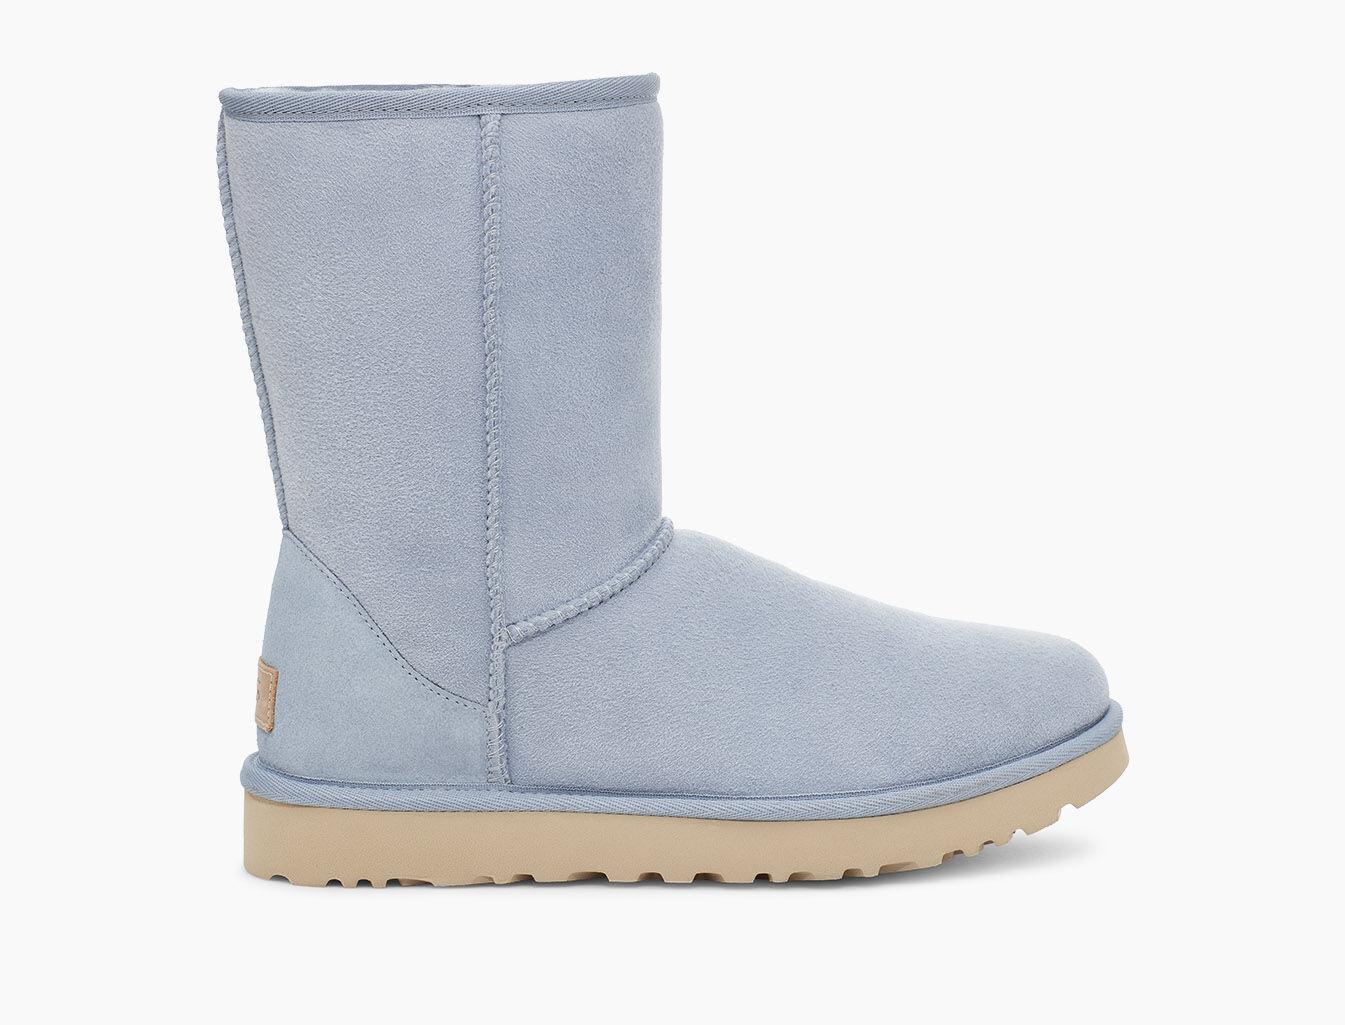 UGG Classic Sheepskin Boots | UGG® Official